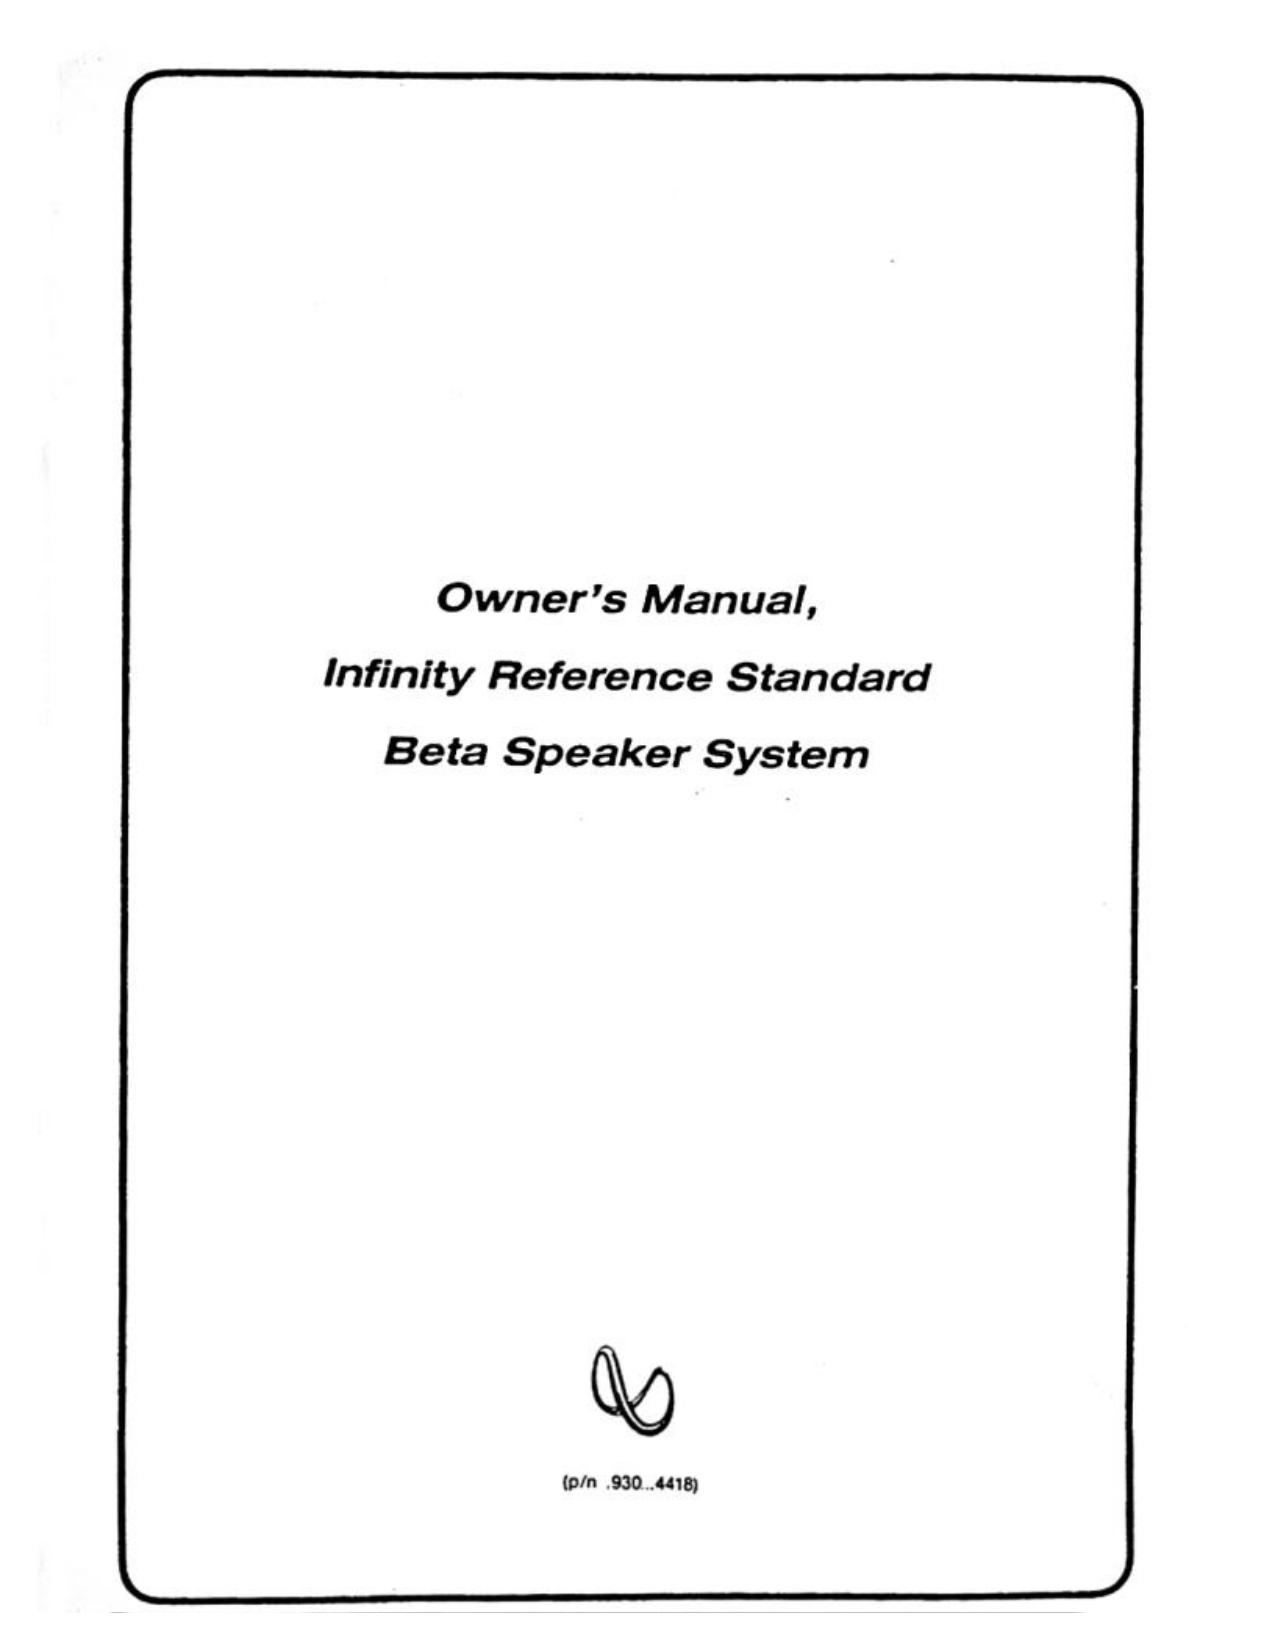 Download free pdf for Infinity Beta 10 Speaker manual